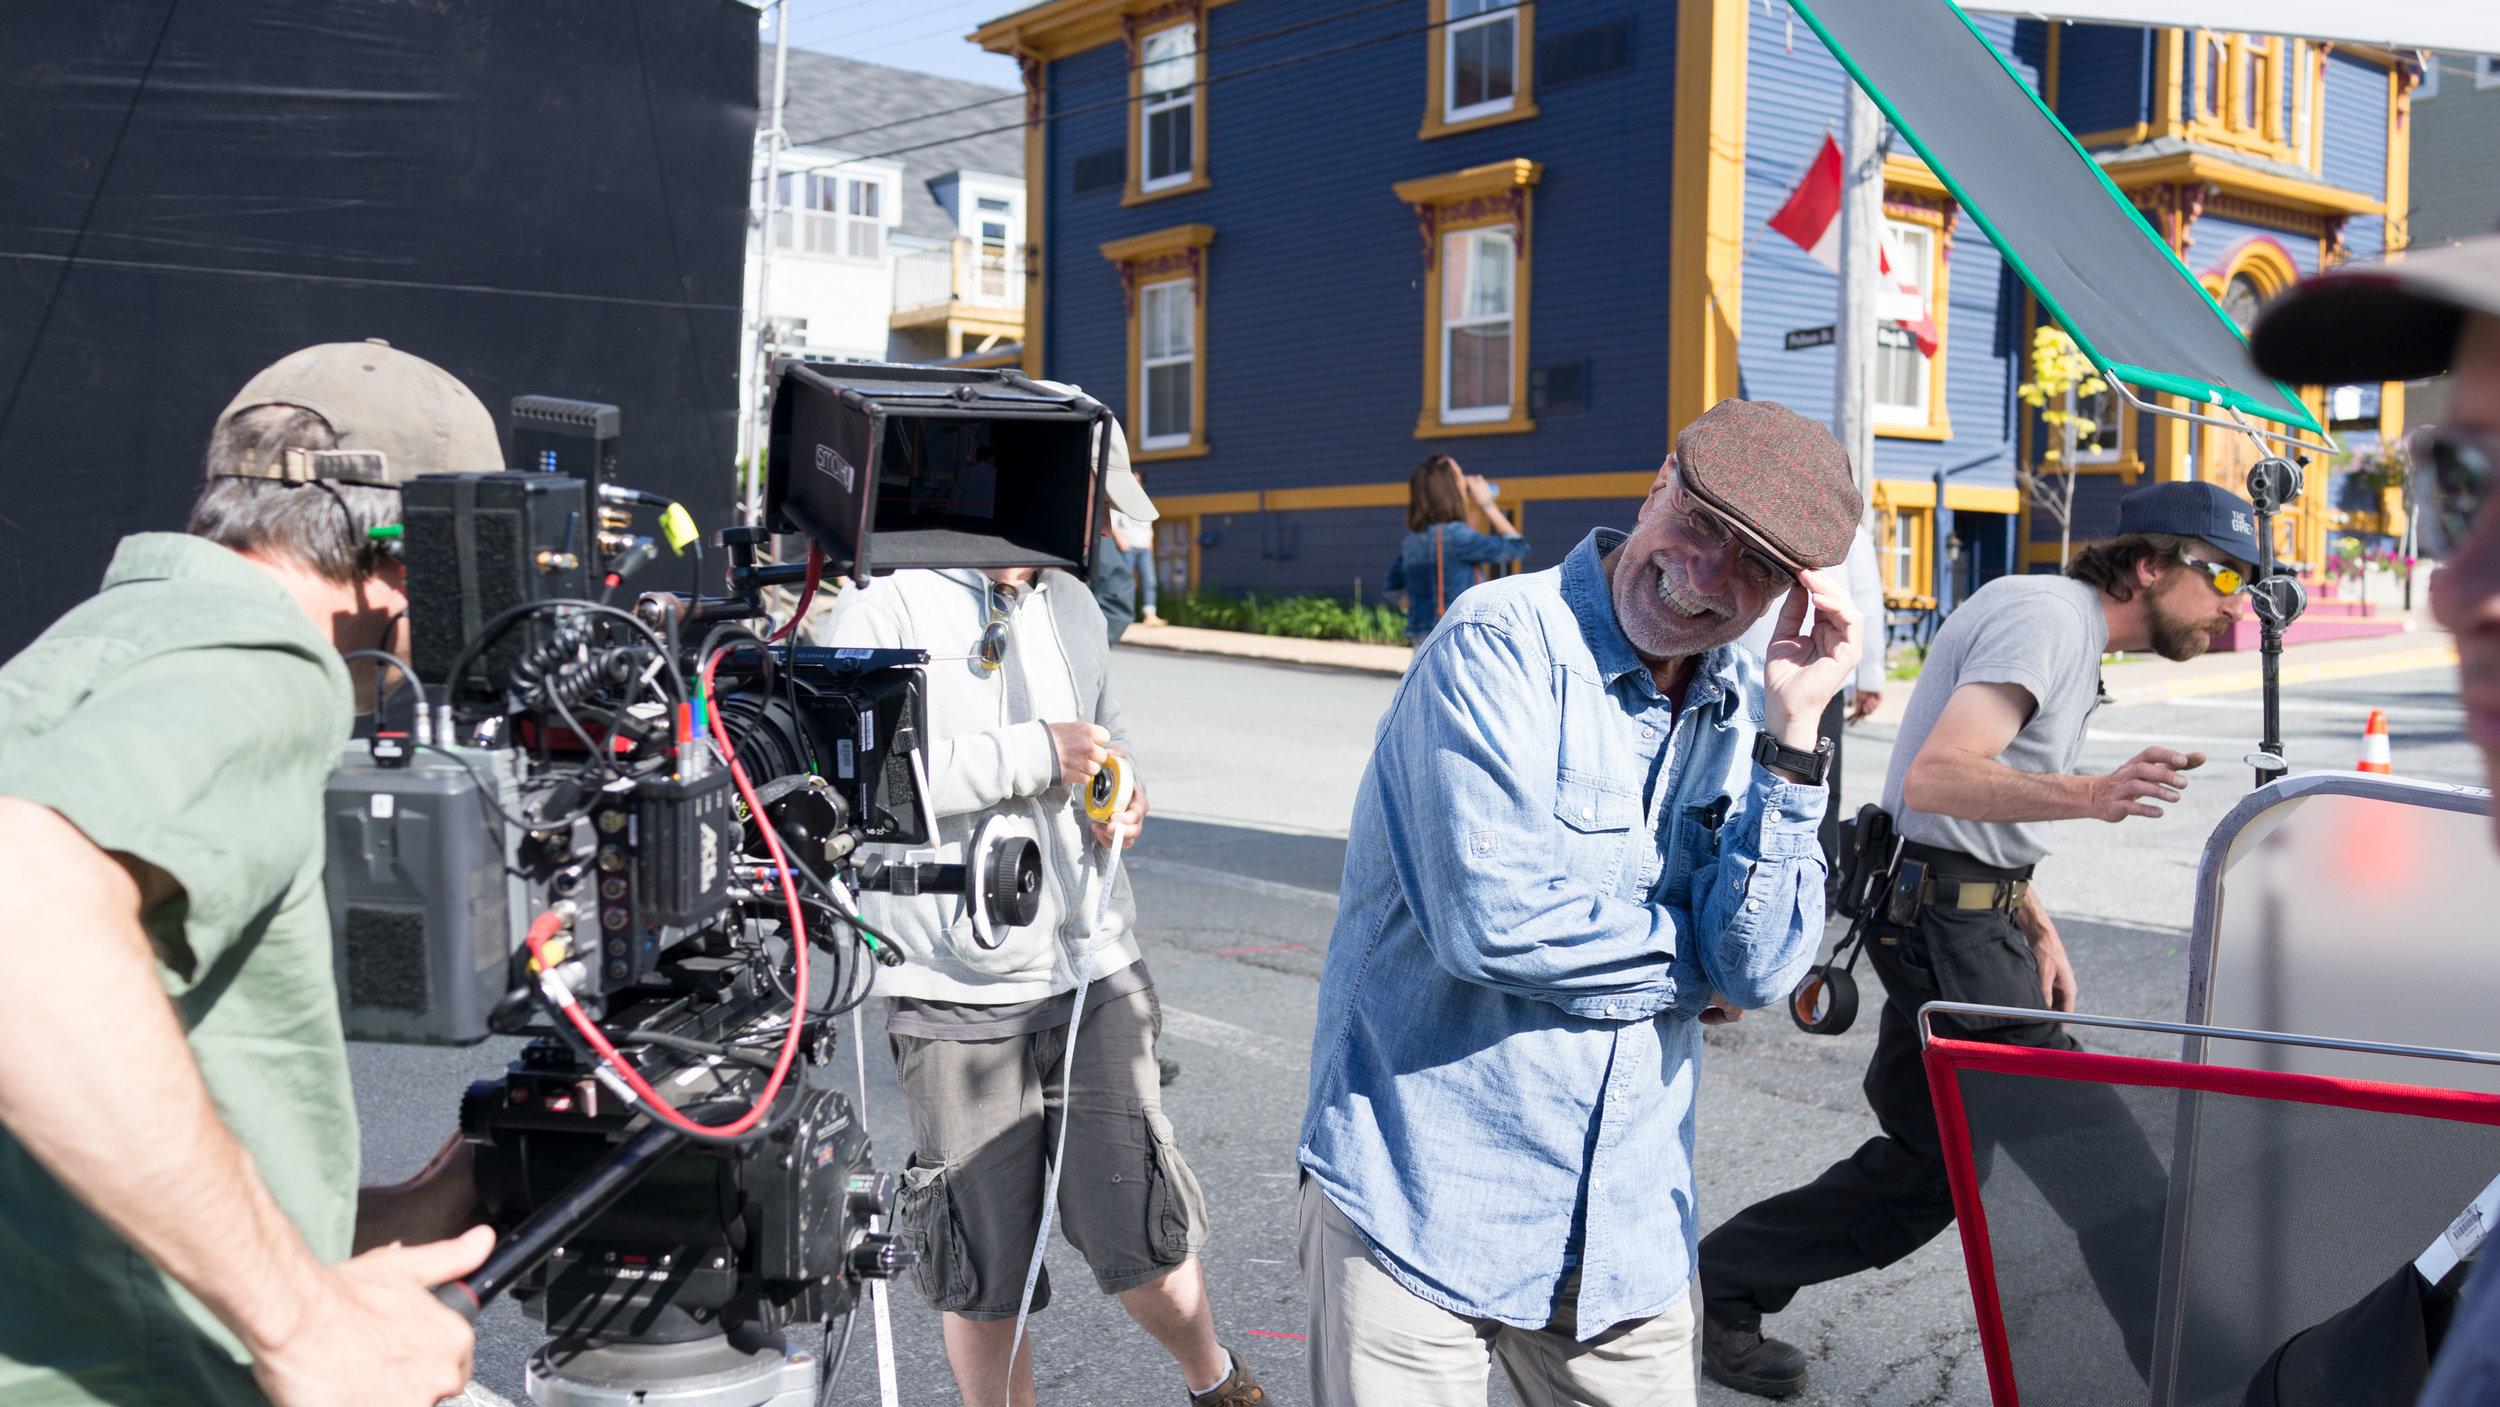 Javier-Aguirresarobe-Director-de-Fotografia.jpg